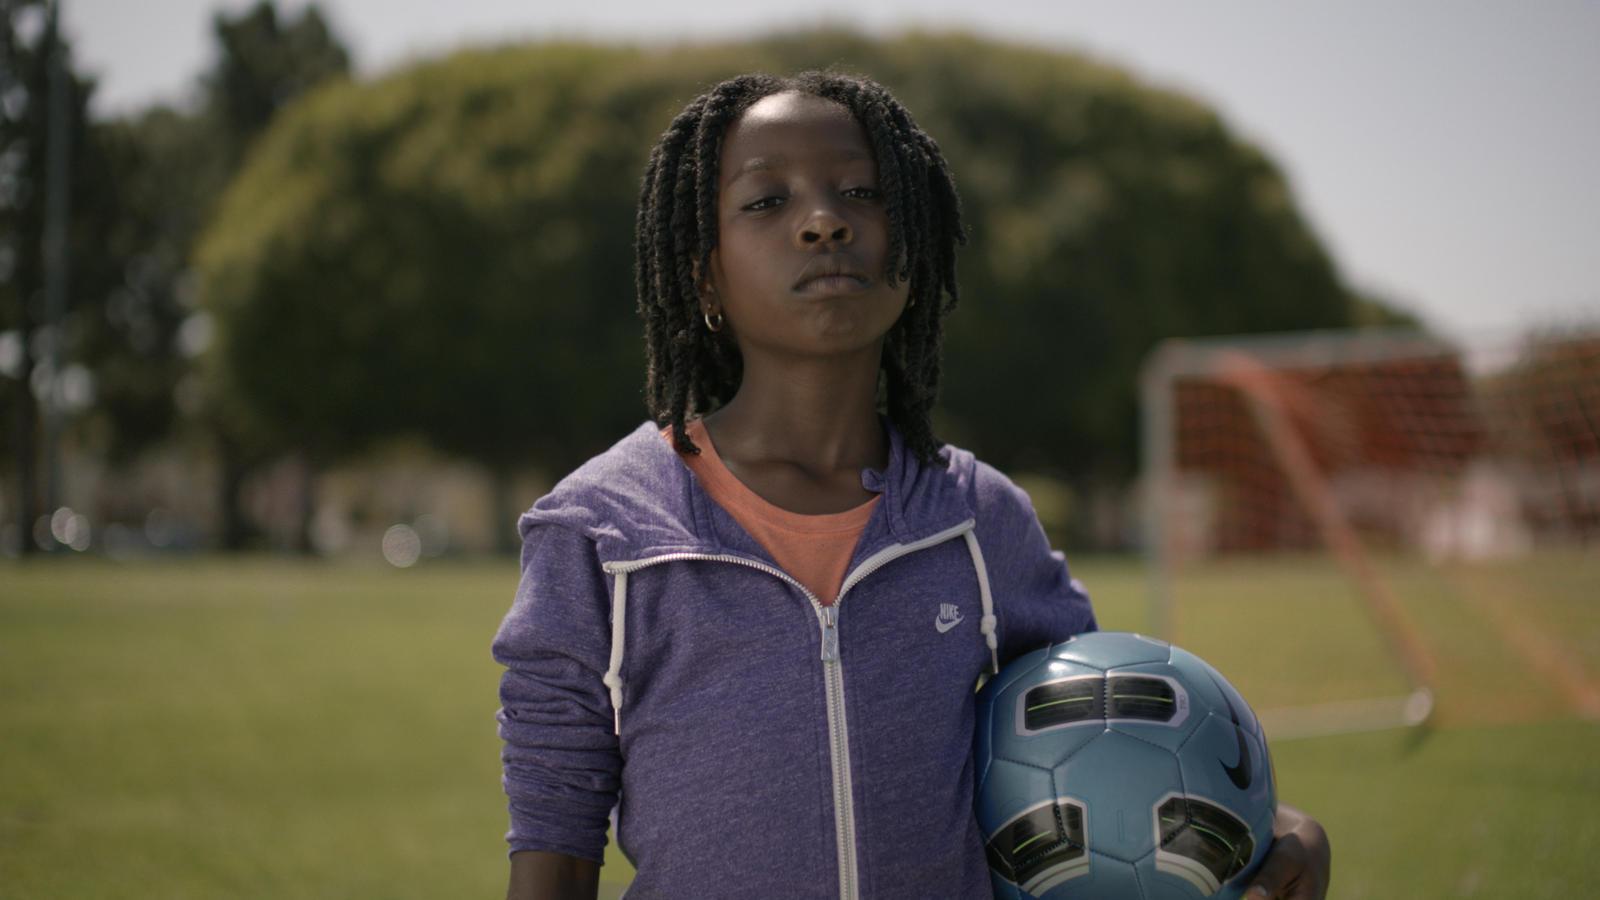 Nike Celebrates Women in Sport With